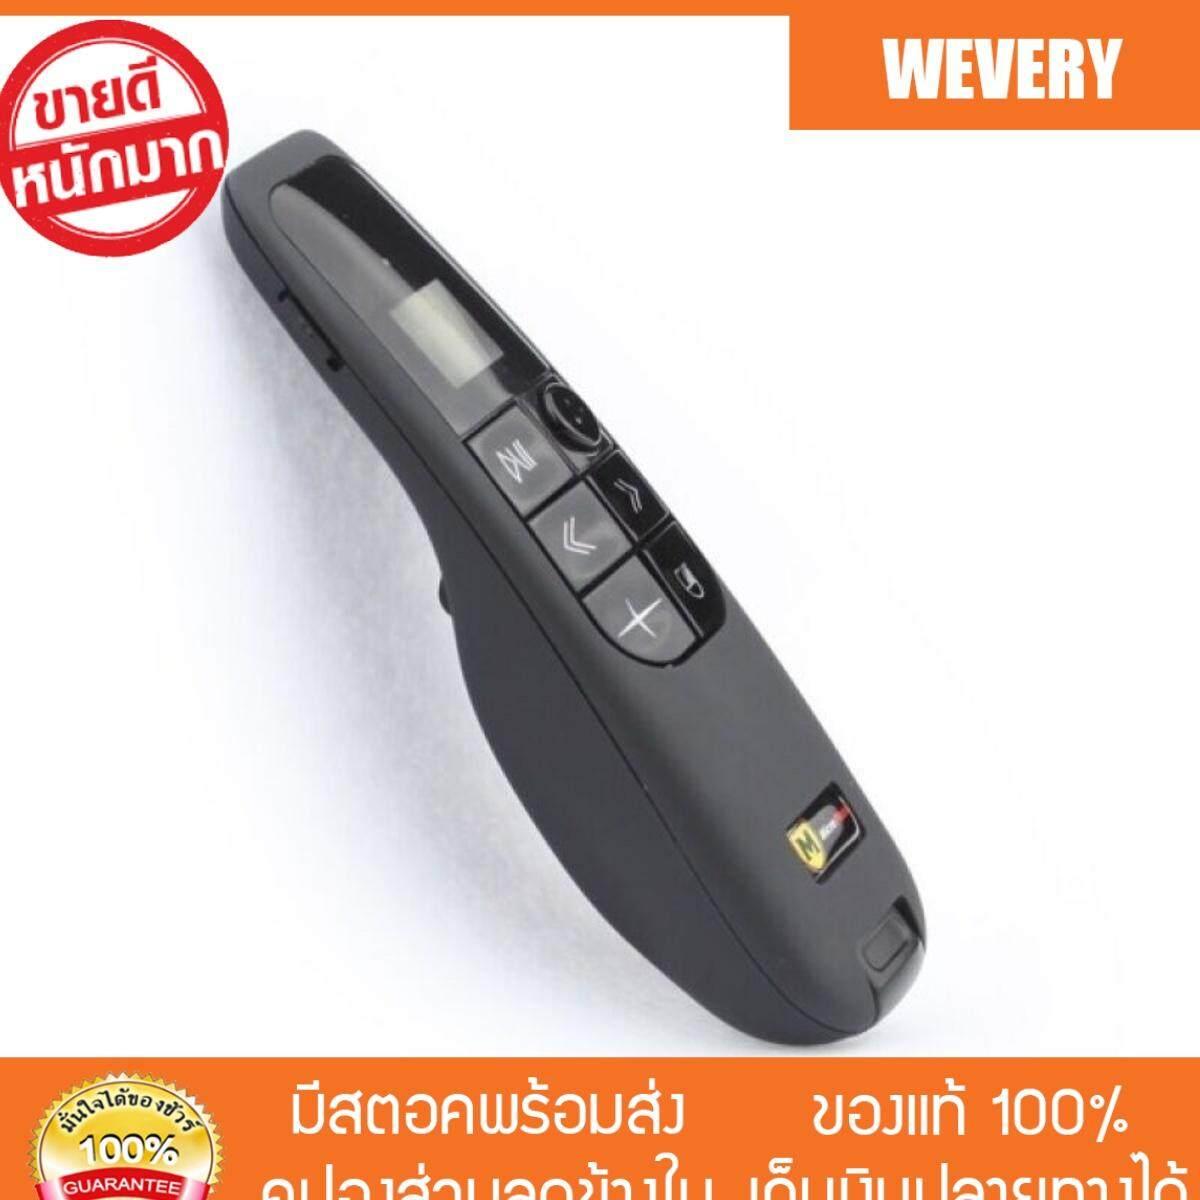 [Wevery] เลเซอร์พอยเตอร์ MICROPACK รุ่น WPM-03 รีโมทพรีเซนต์งาน presentation remote ส่ง Kerry เก็บปลายทางได้